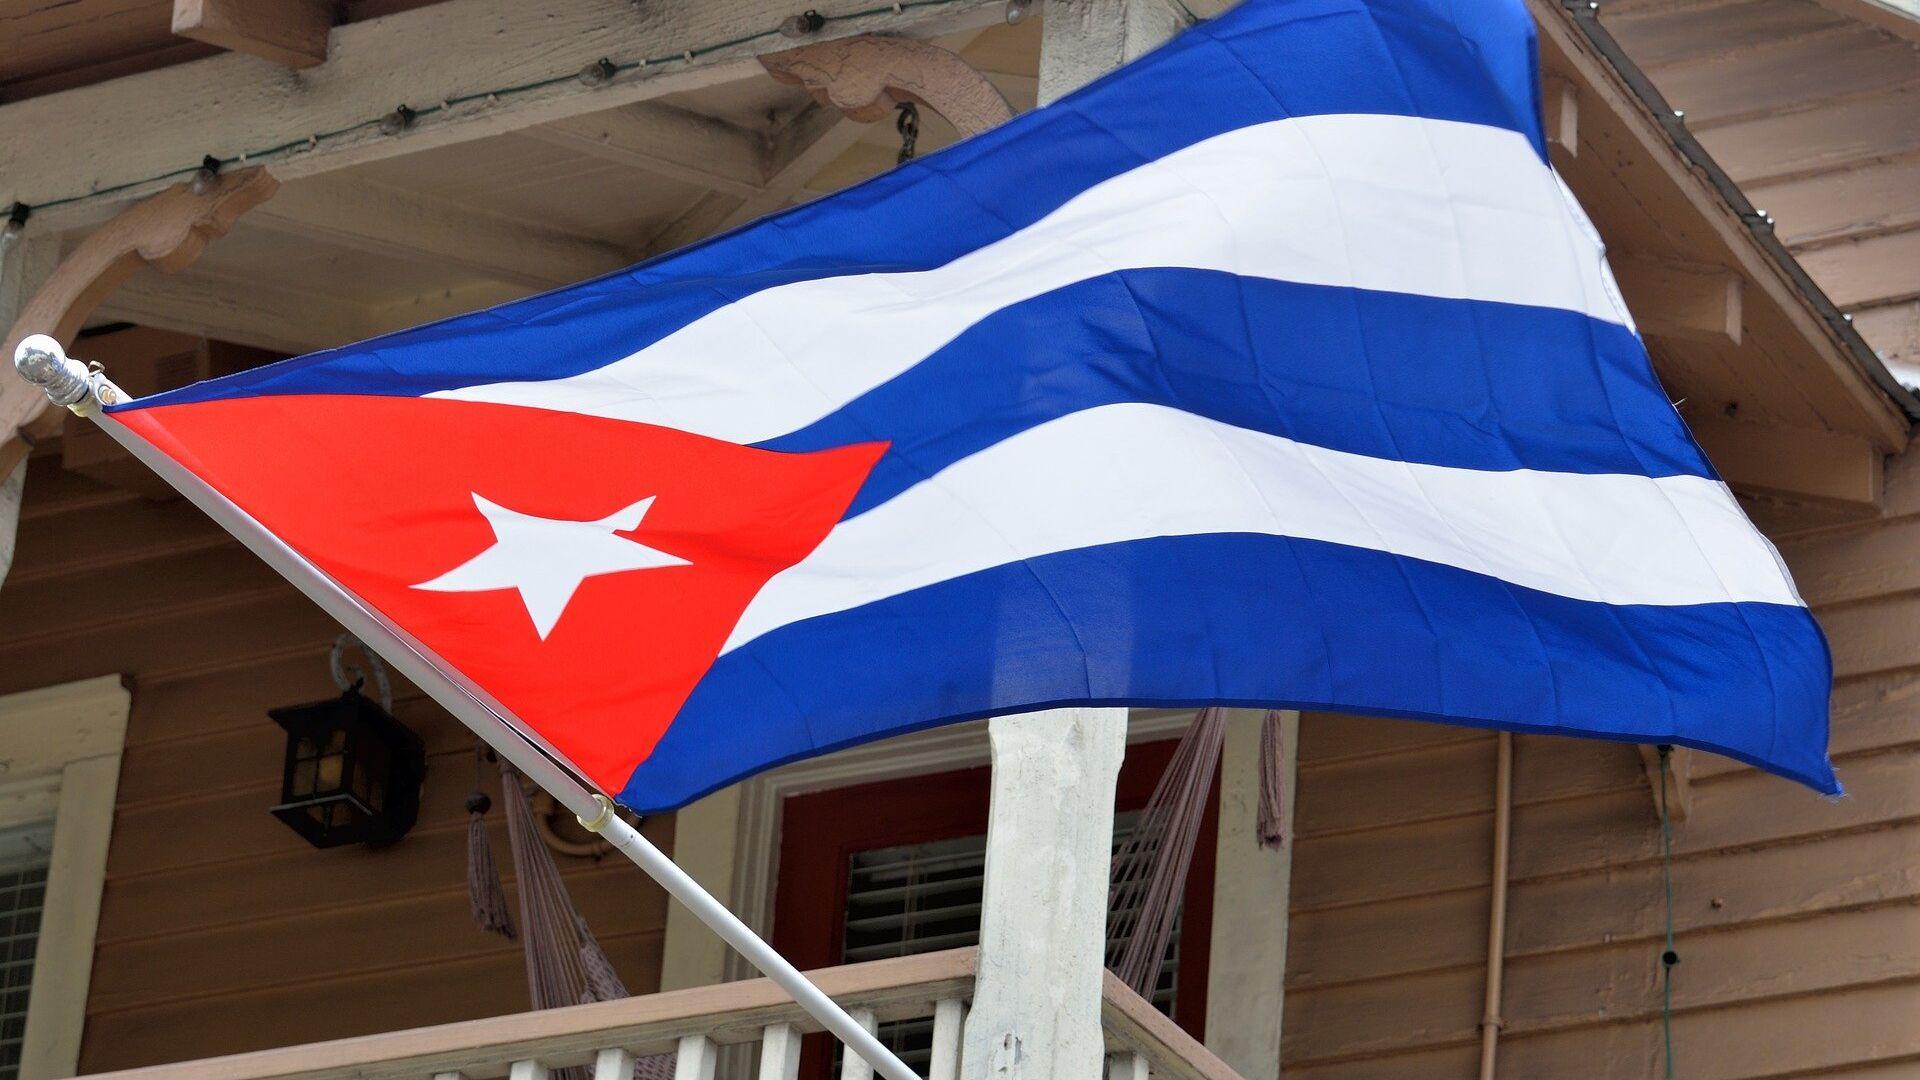 La bandera de Cuba - Sputnik Mundo, 1920, 17.03.2021